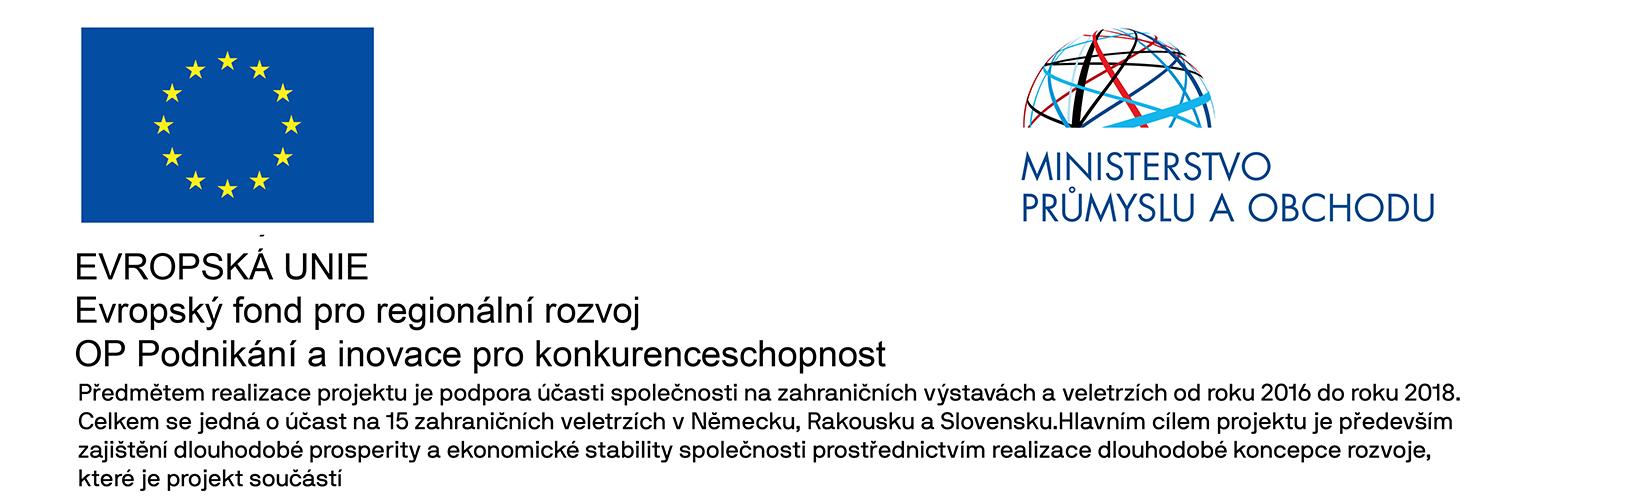 eu projekt - Kontakty